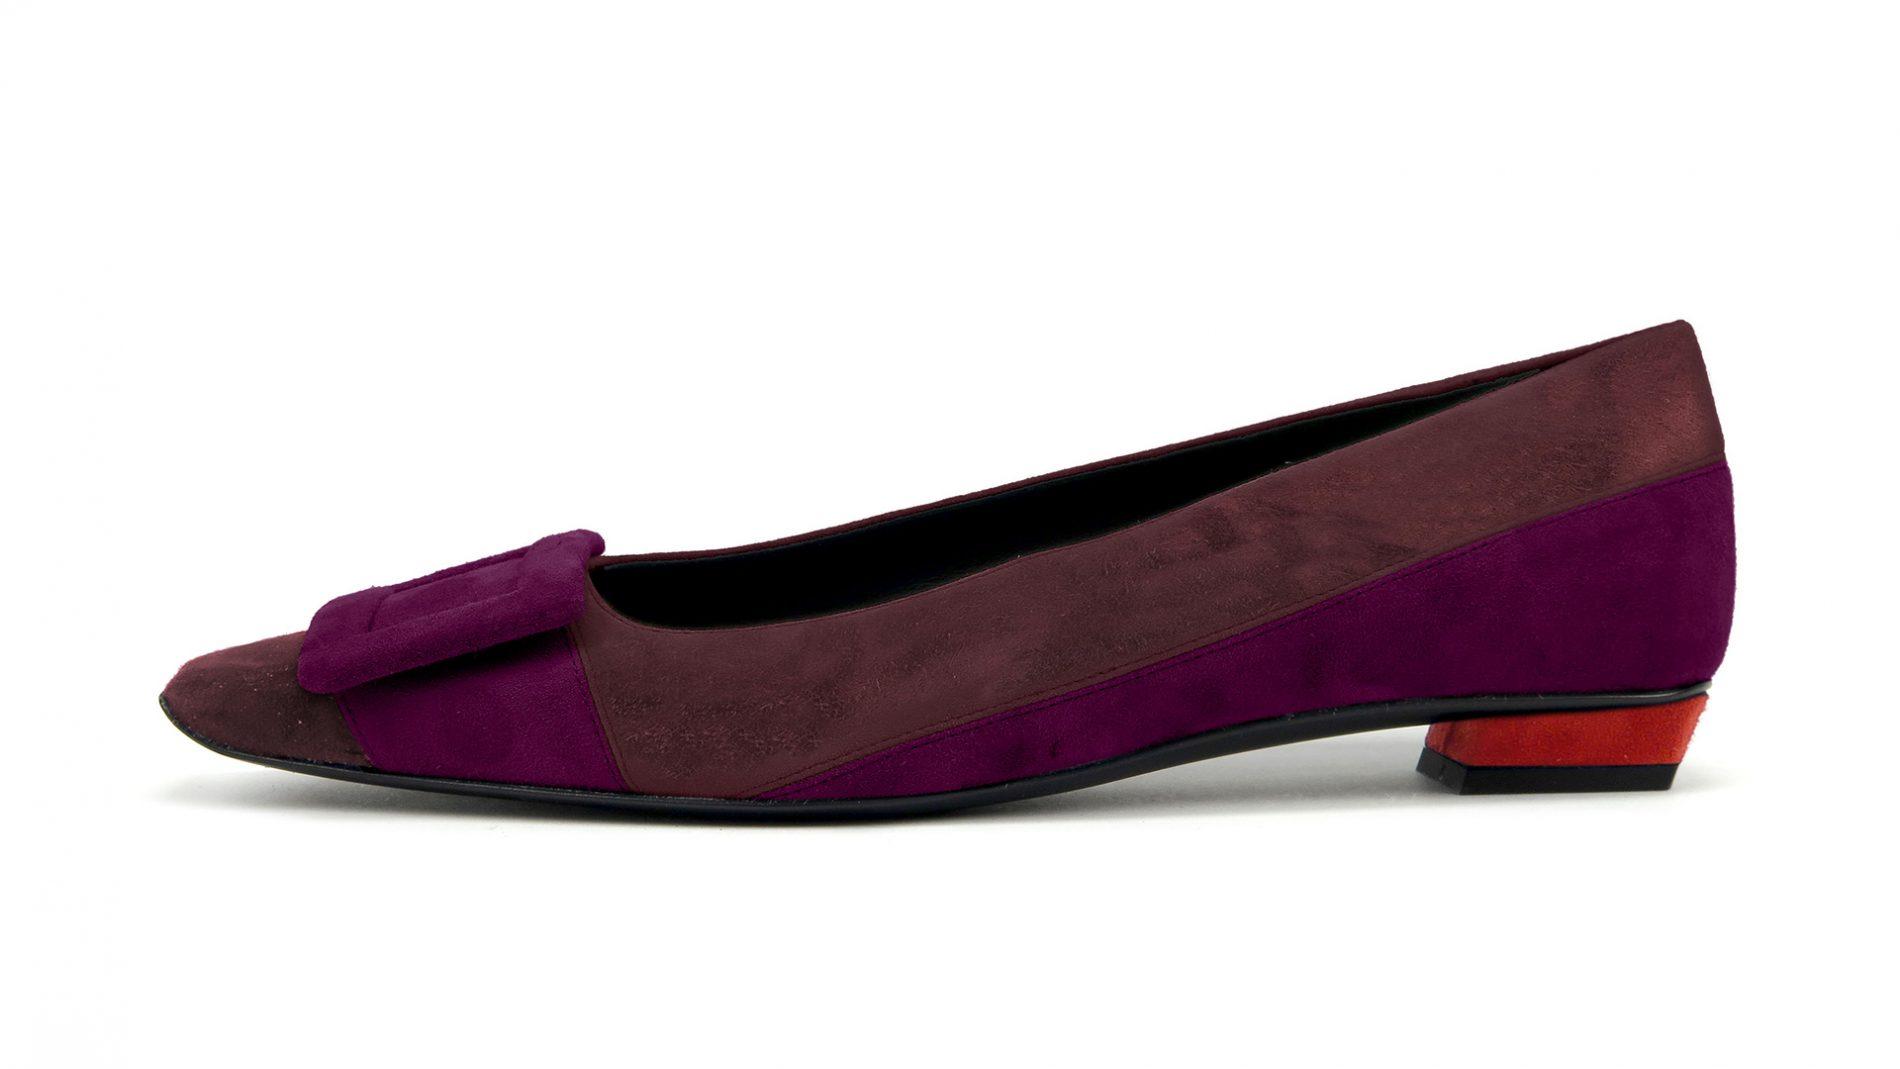 El Corte Inglés Designer Shoes Roger Vivier Ballet Flats